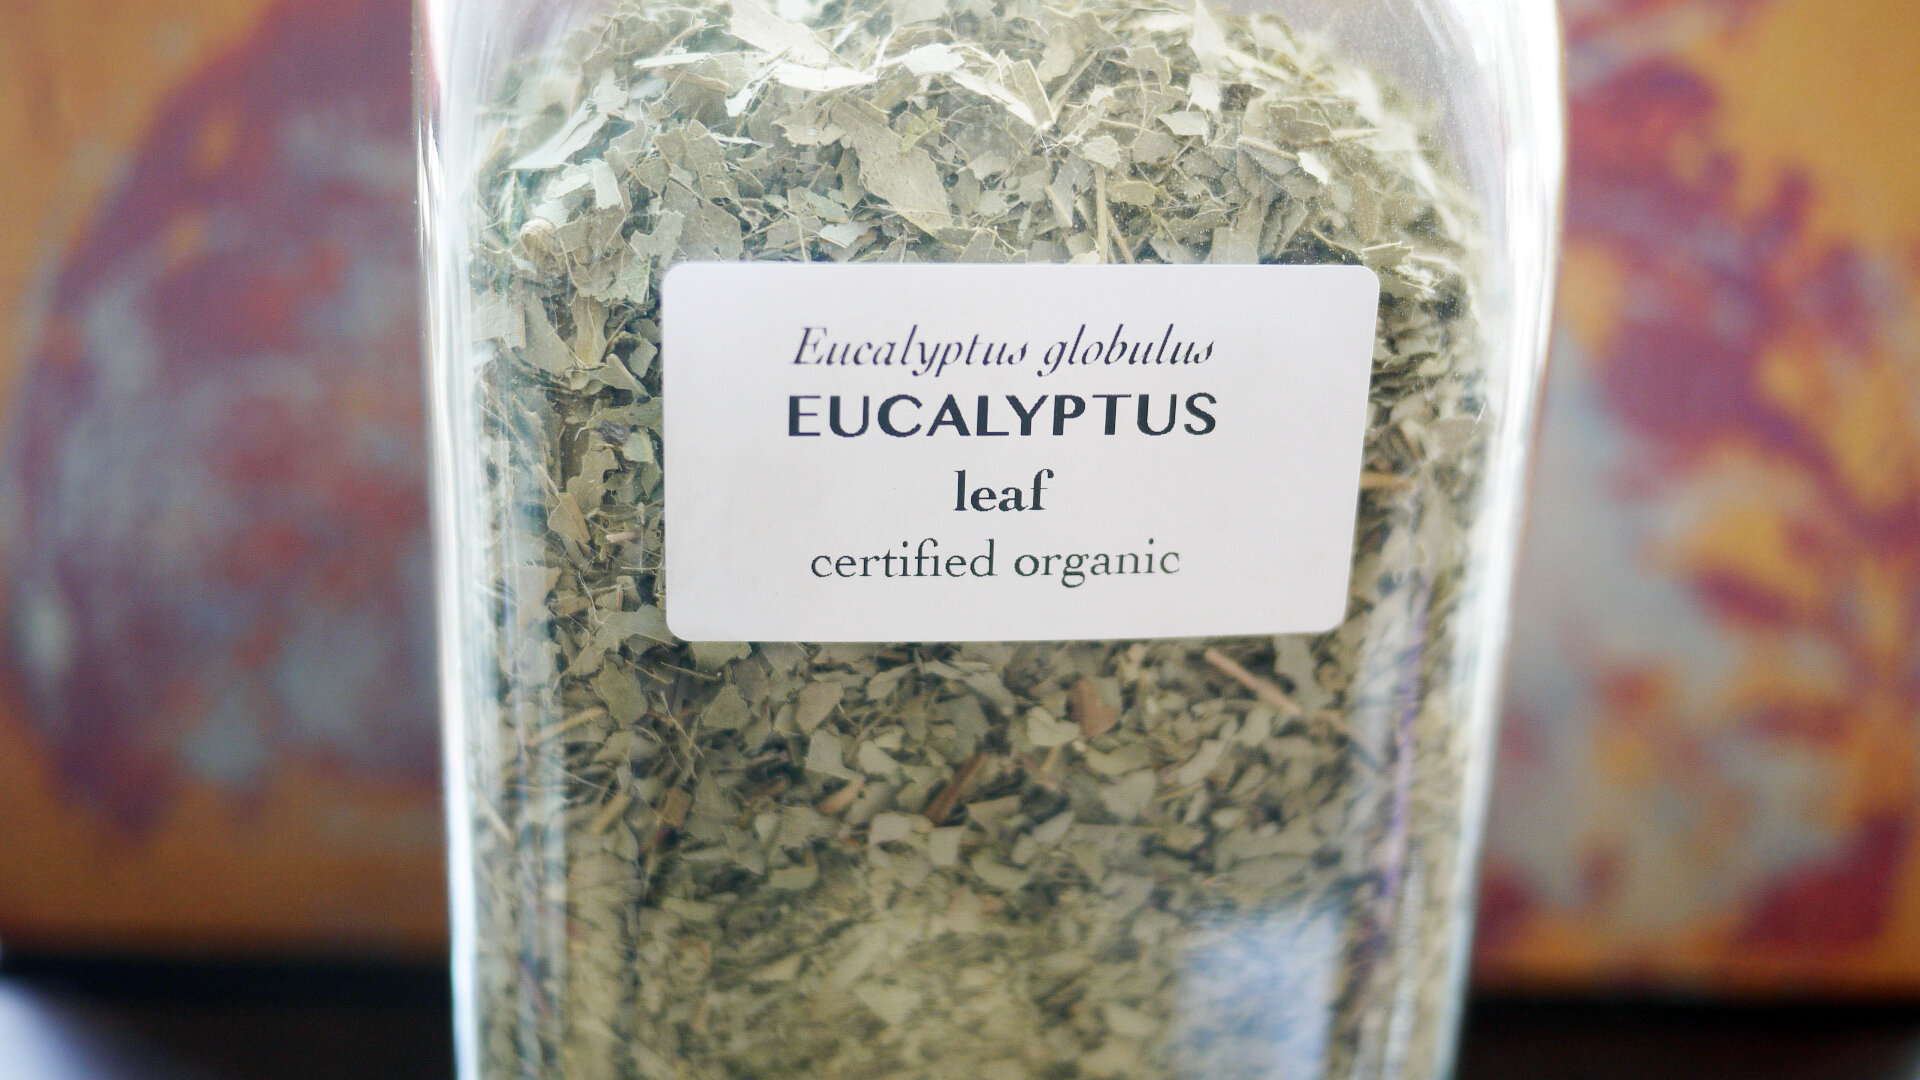 Eucalyptusleaf.jpg